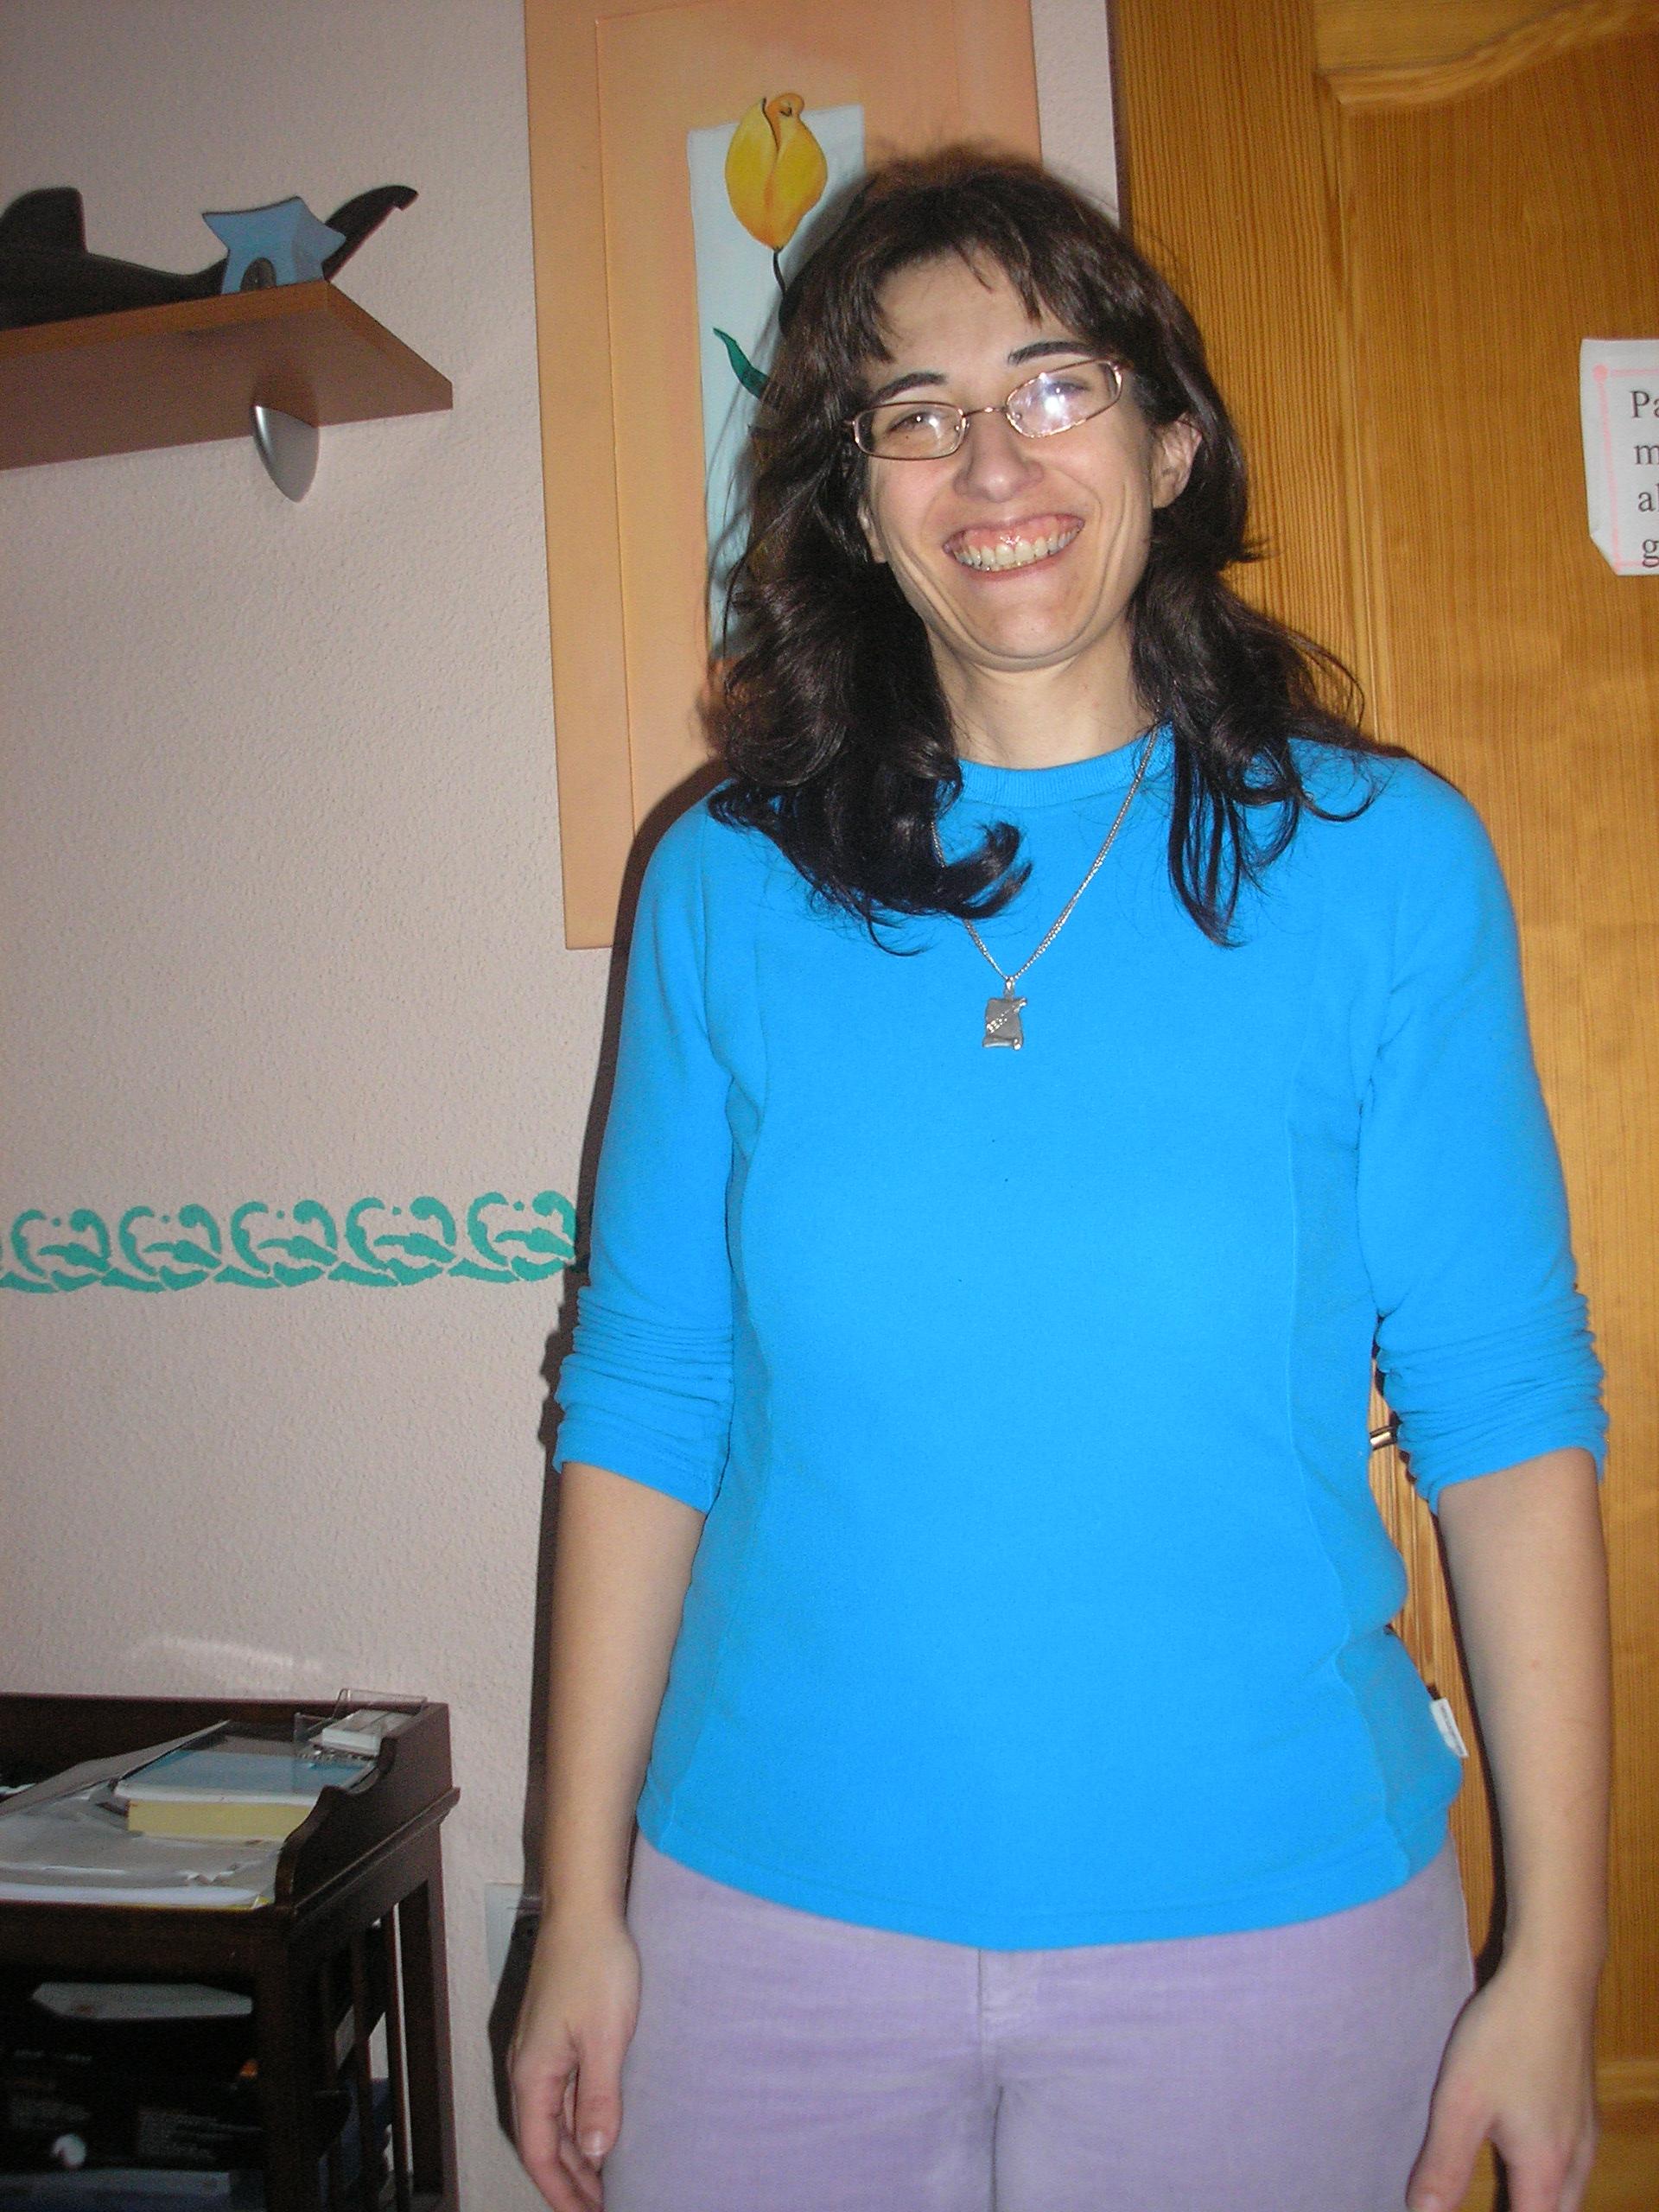 2011 peso 70 kg